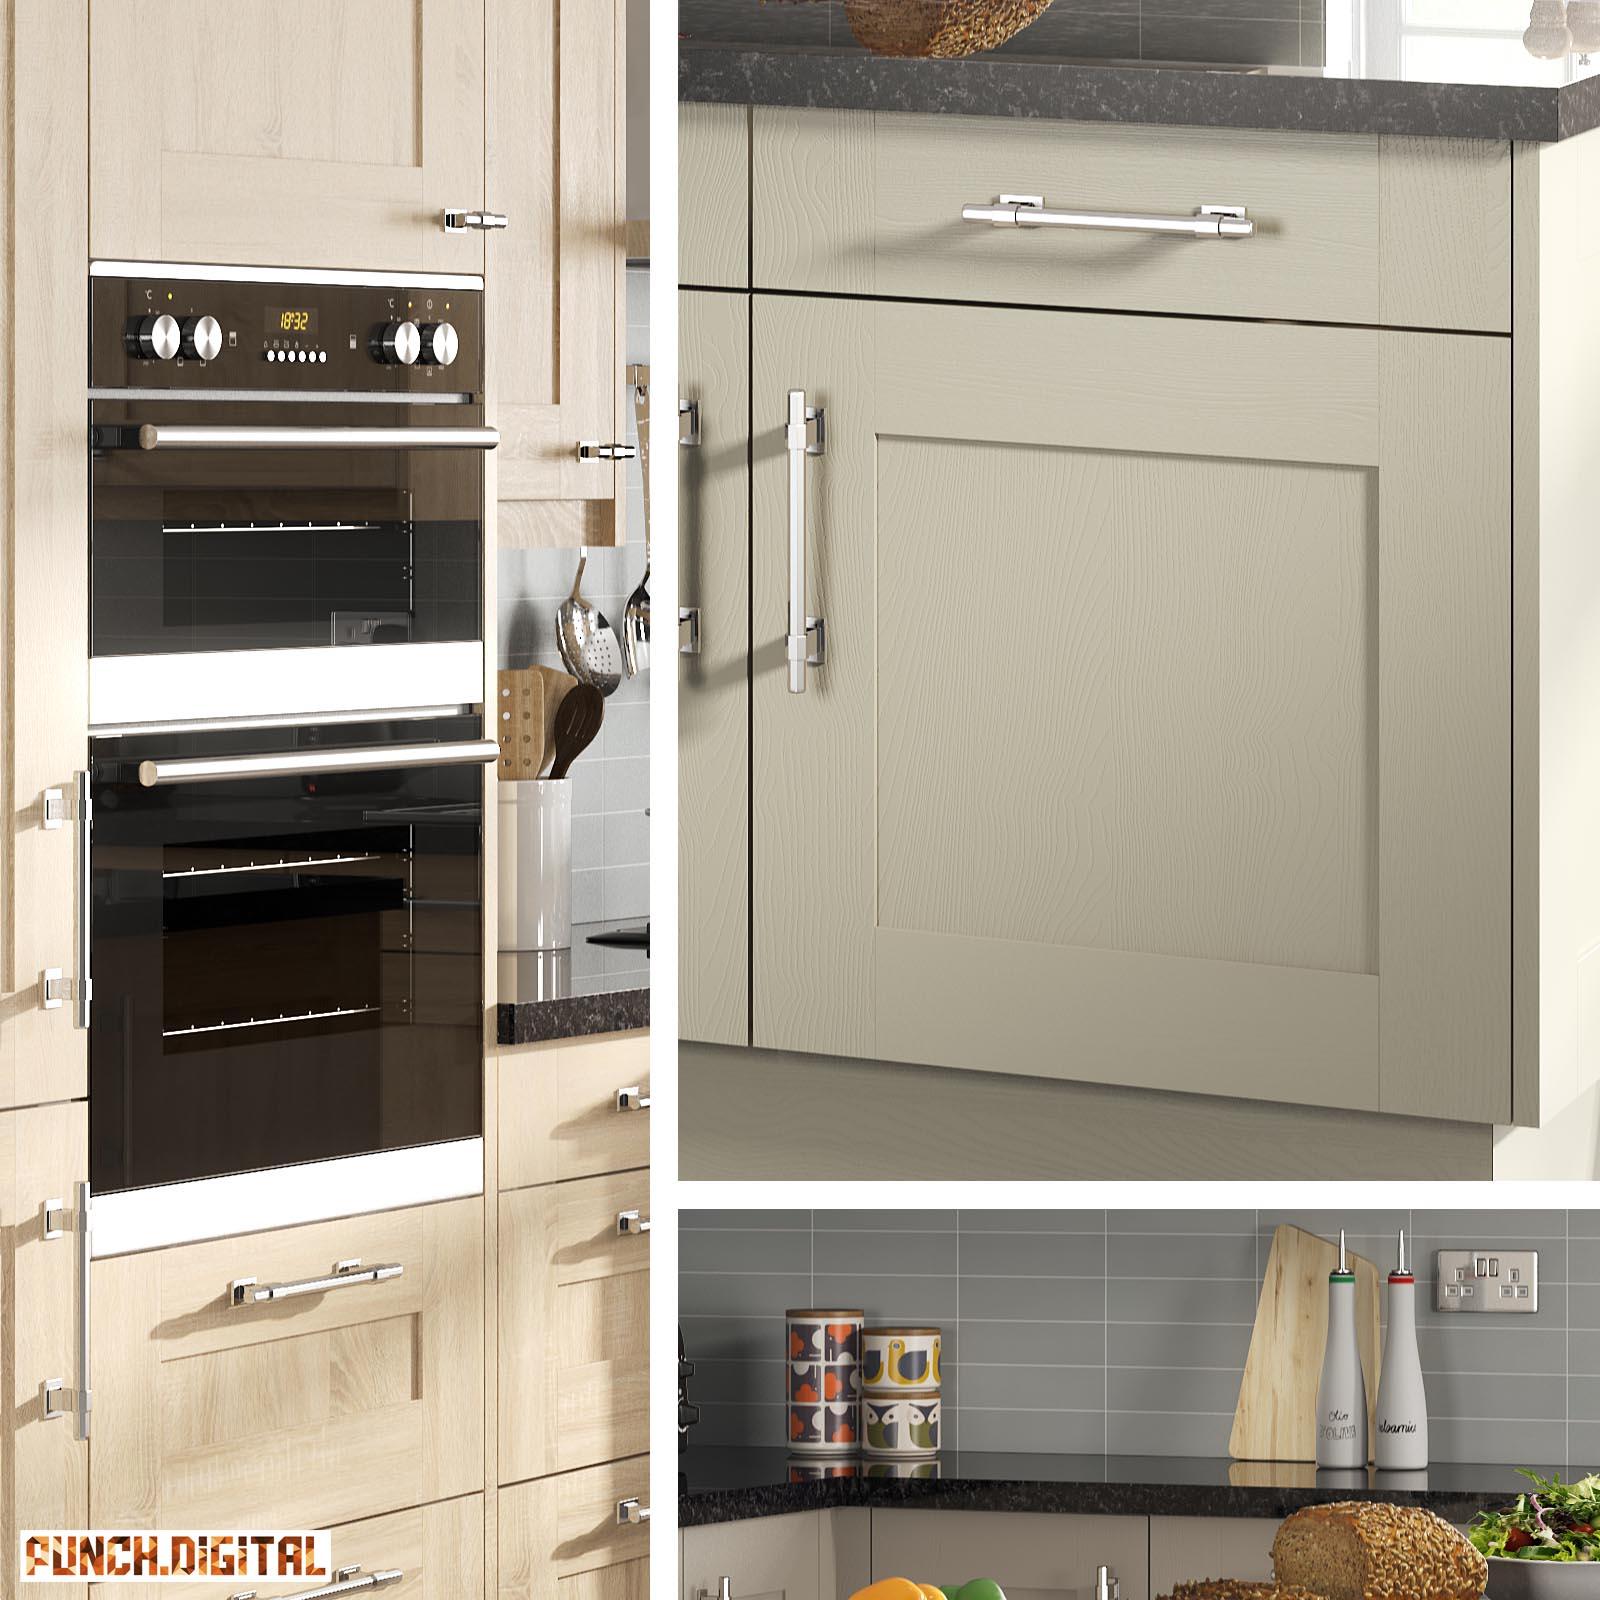 shaker kitchen project // interior cgi room set & product